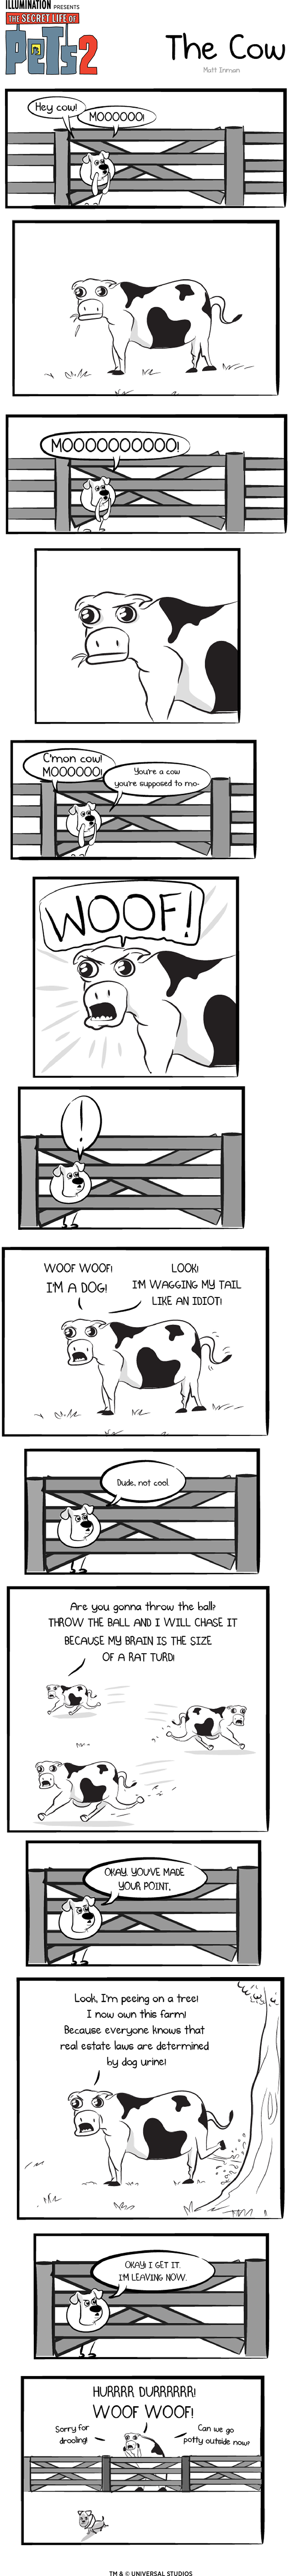 Max versus a cow